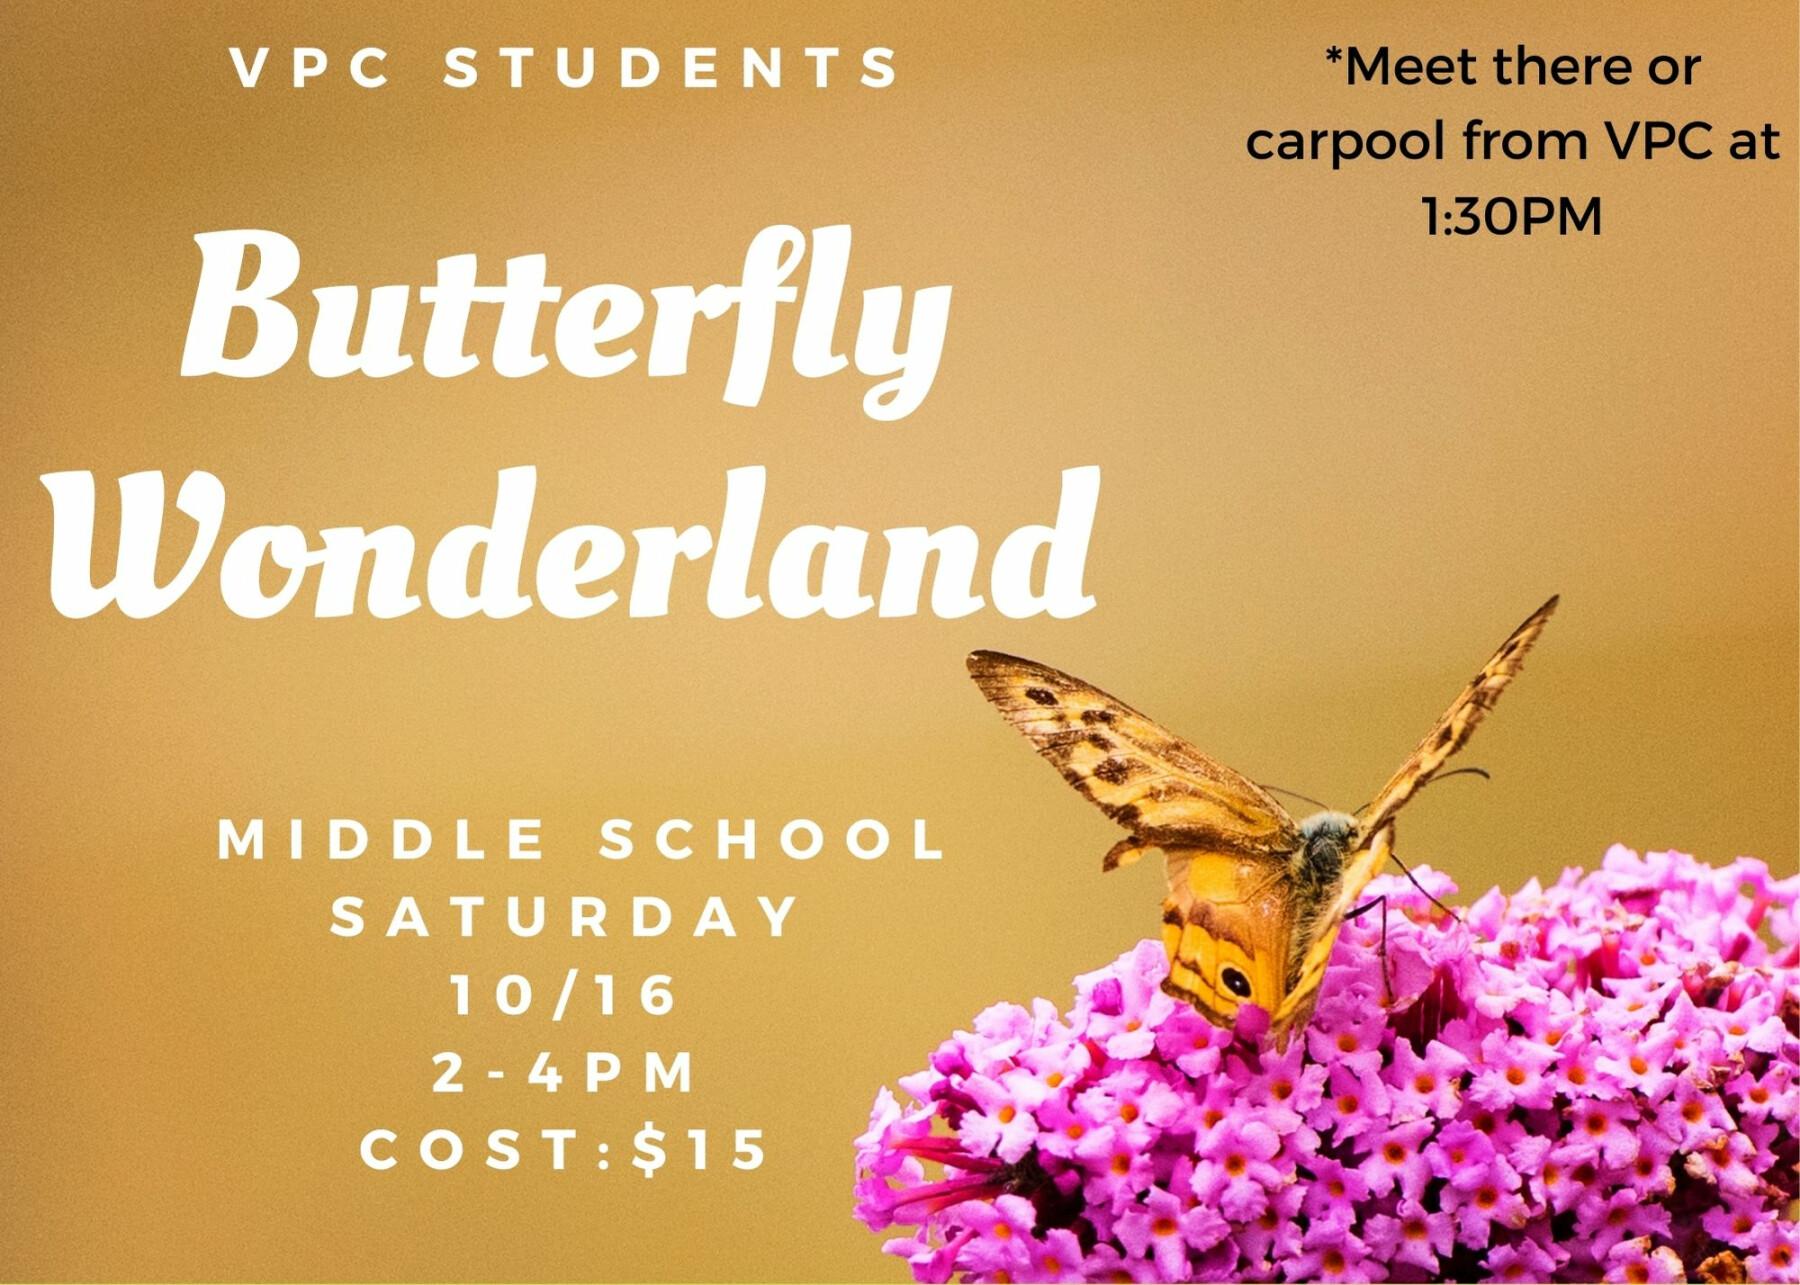 VPC Middle School: Butterfly Wonderland